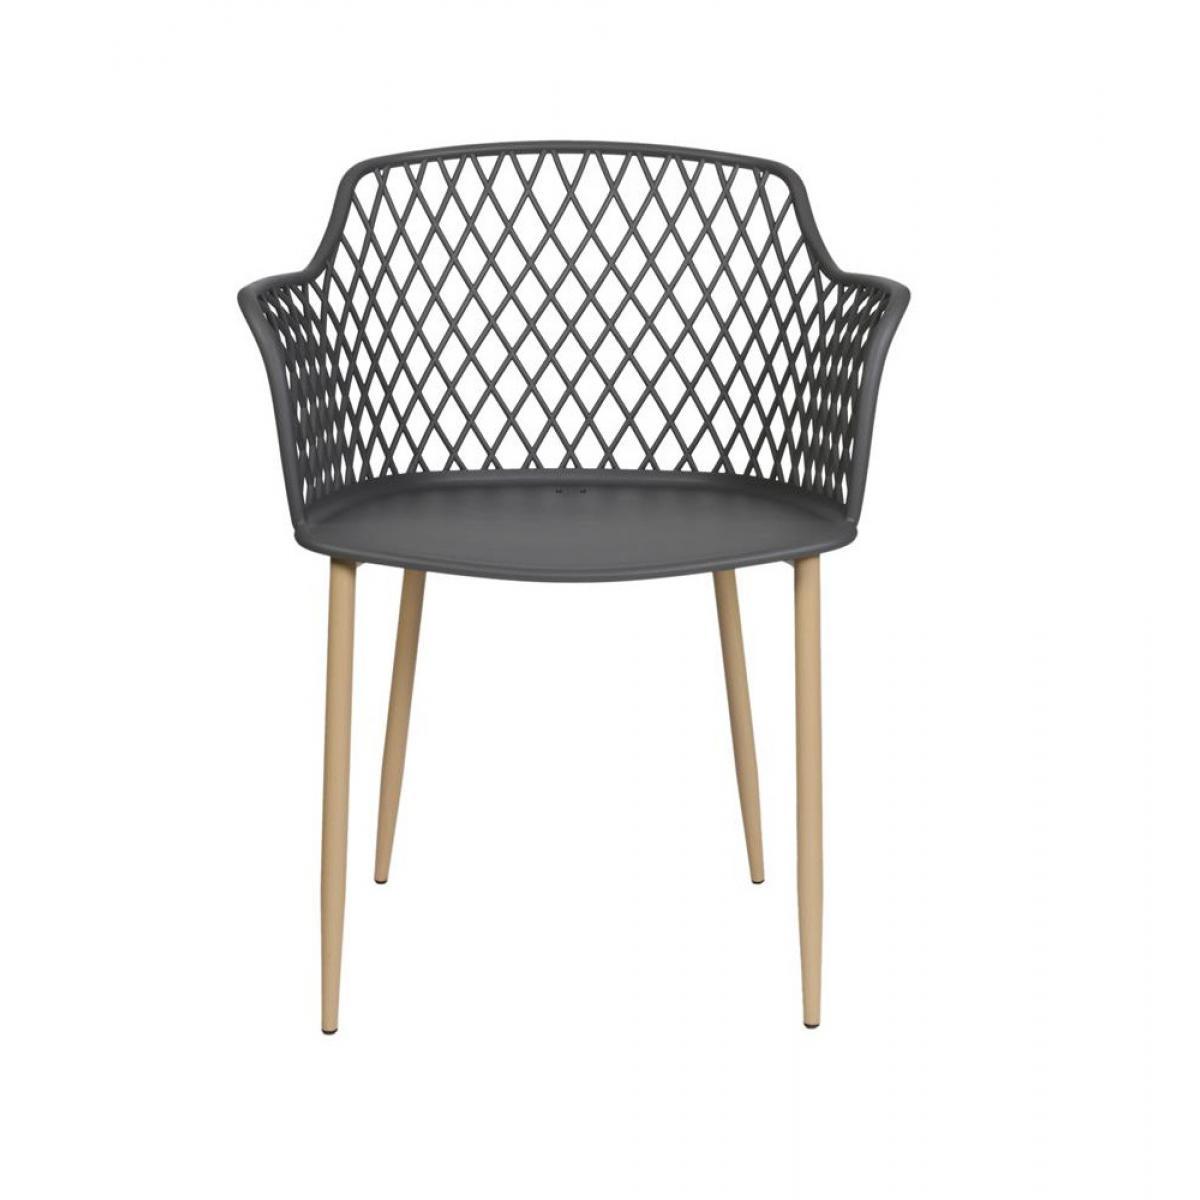 Ac-Deco Chaise - L 51,9 cm x l 47,8 cm x H 83,9 cm - Malaga - Gris